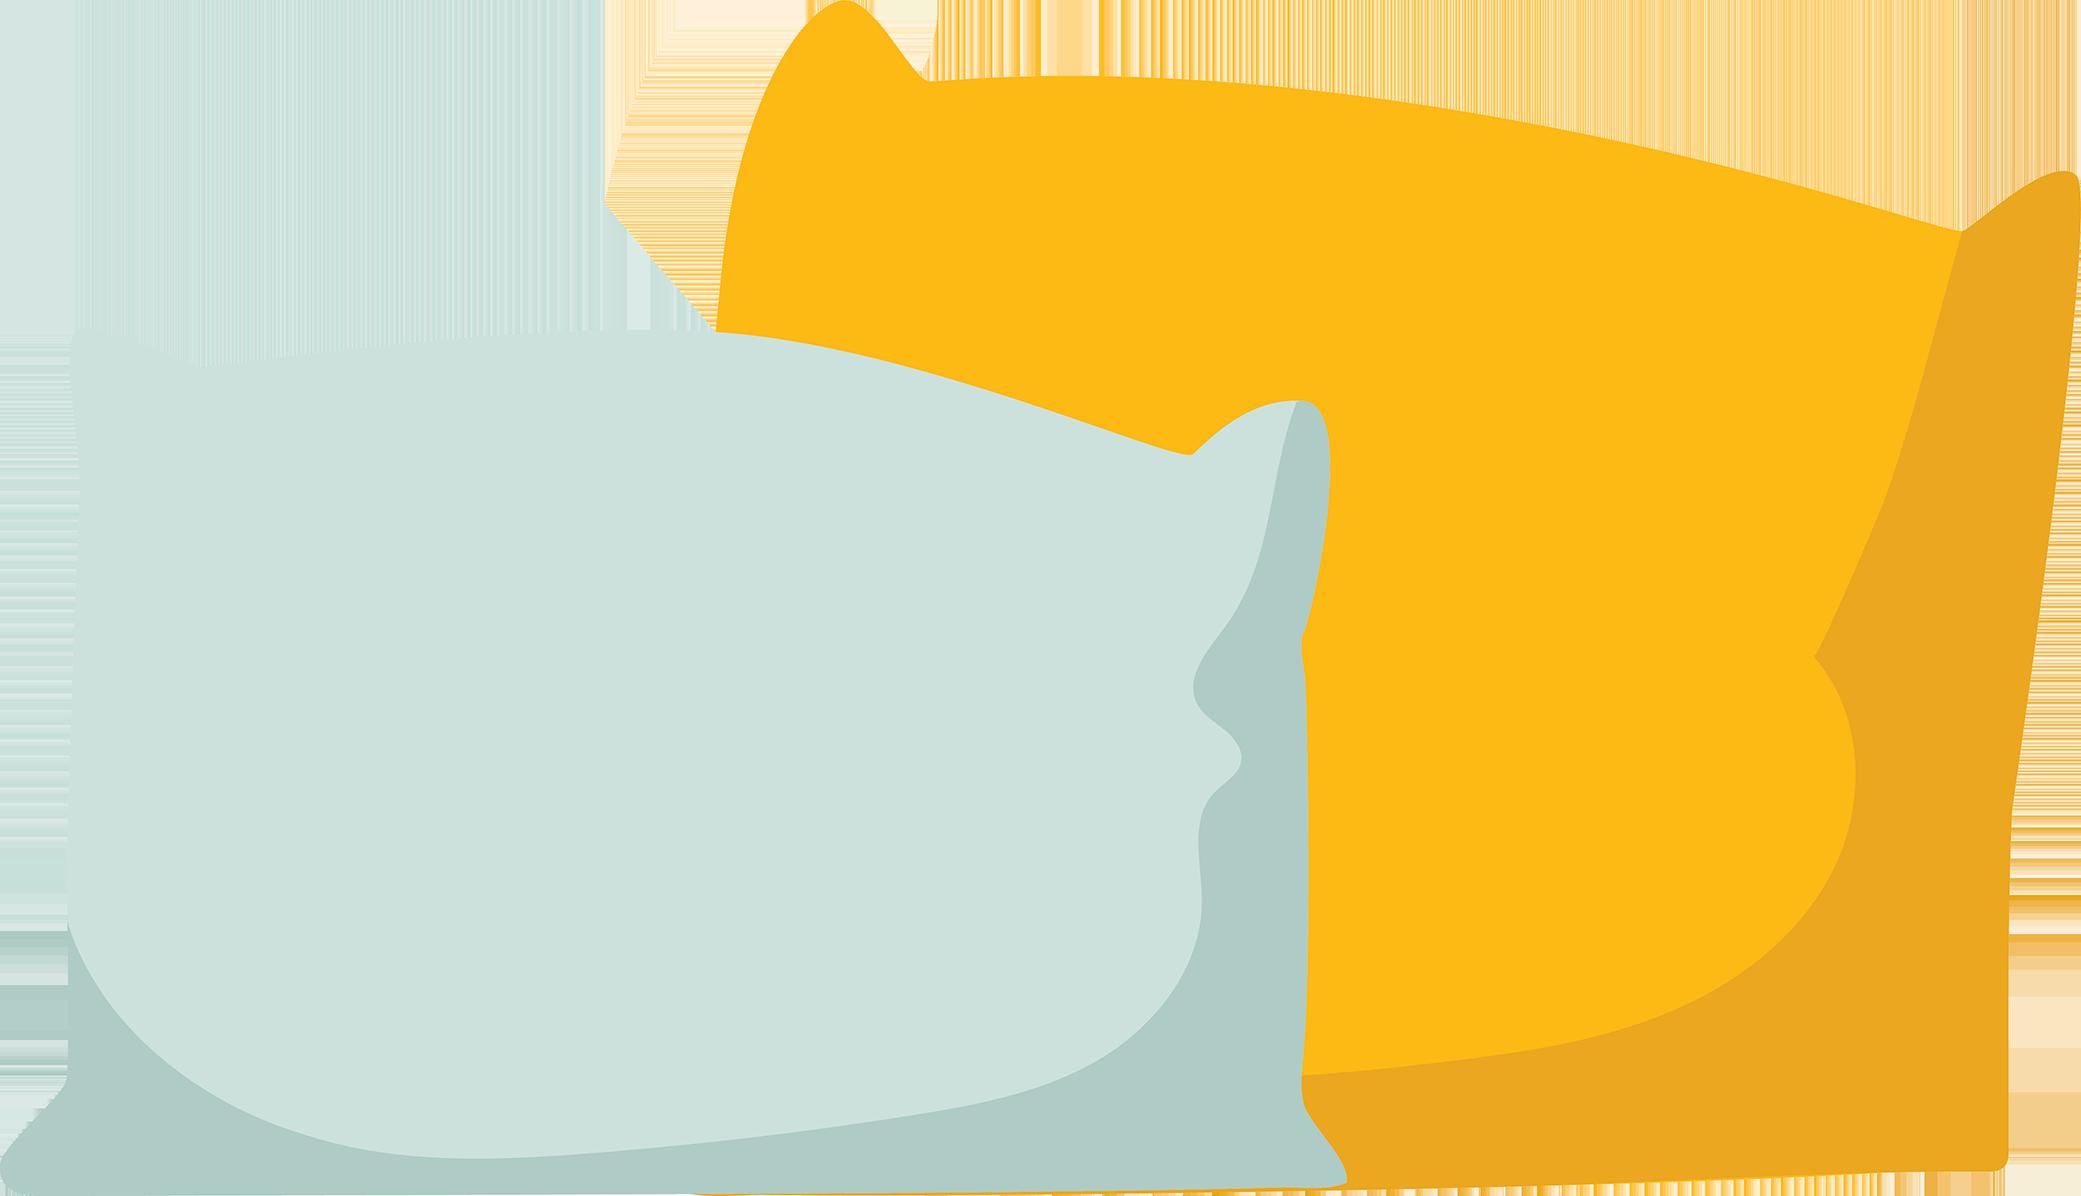 Pillow clipart sleeping bag pillow, Pillow sleeping bag.